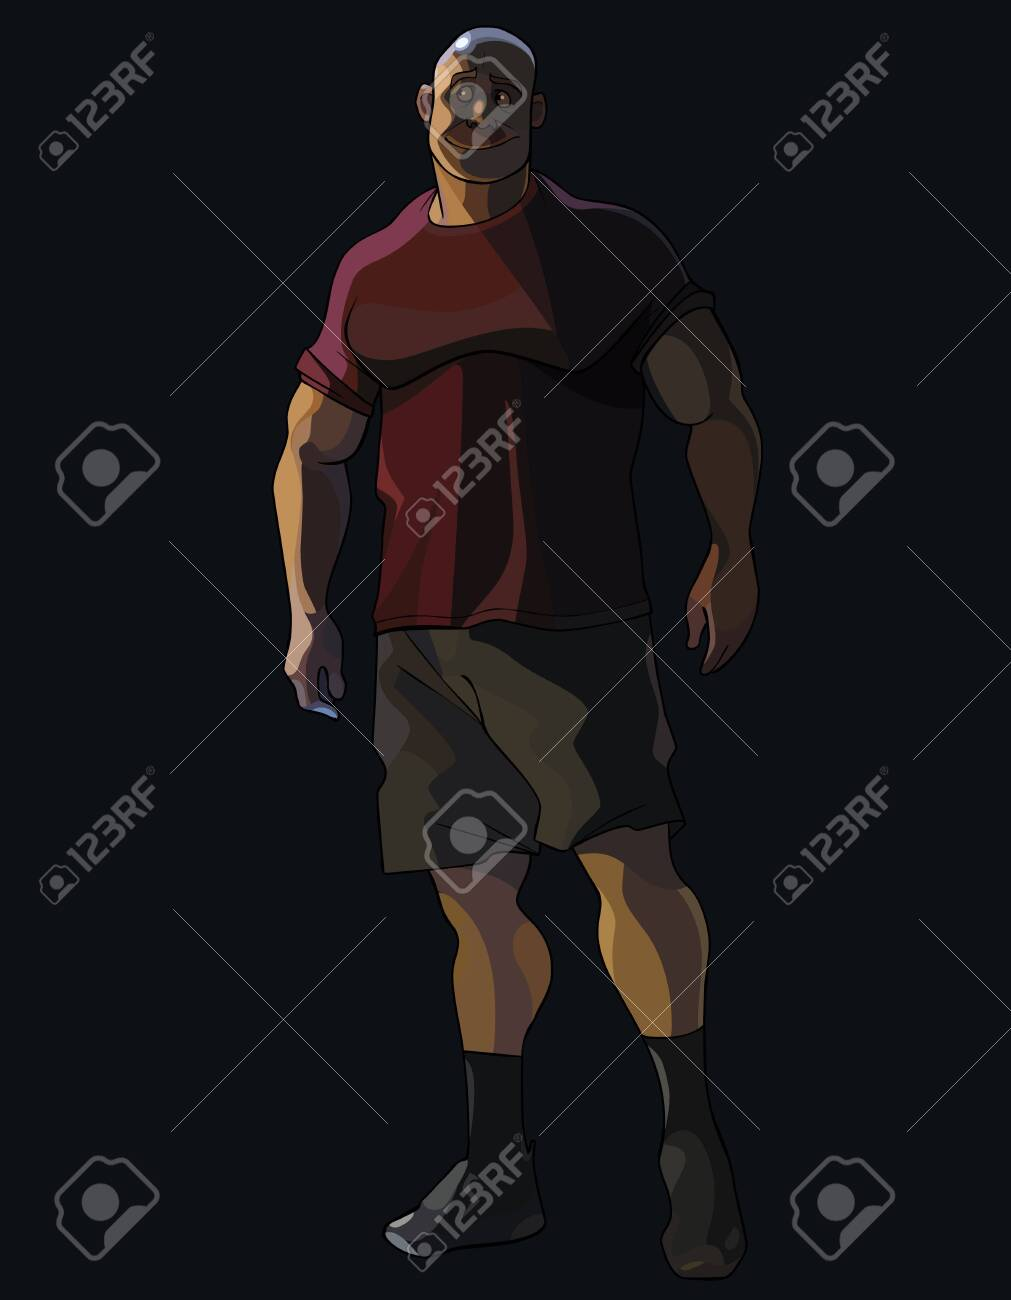 big cartoon smiling muscular man looks away while being in the dark - 149097158